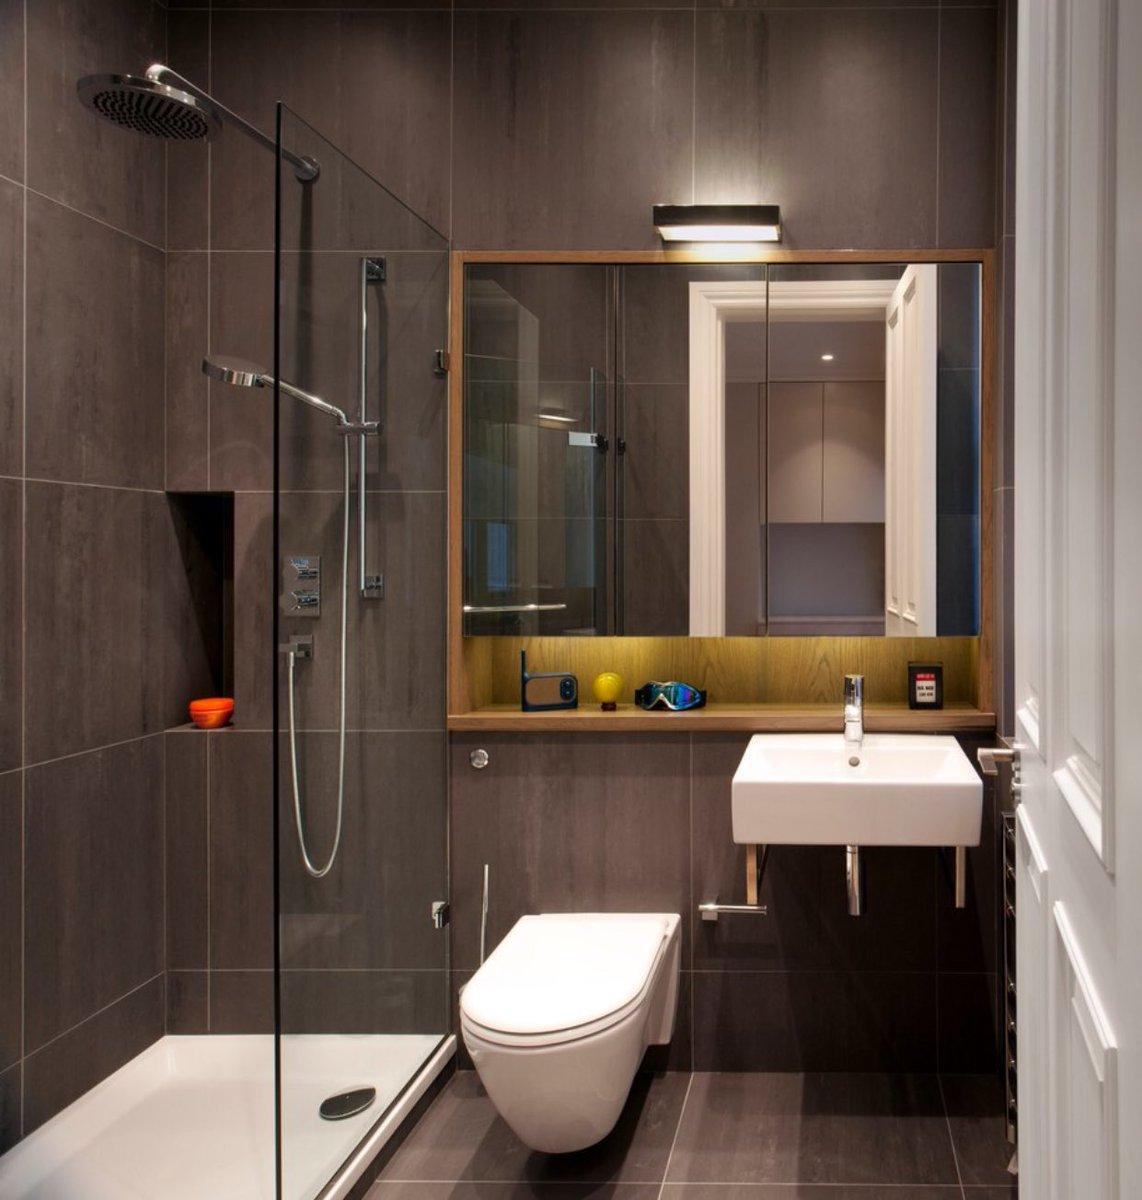 بالصور تصميم حمامات , اجمل ديكورات الحمامات 3285